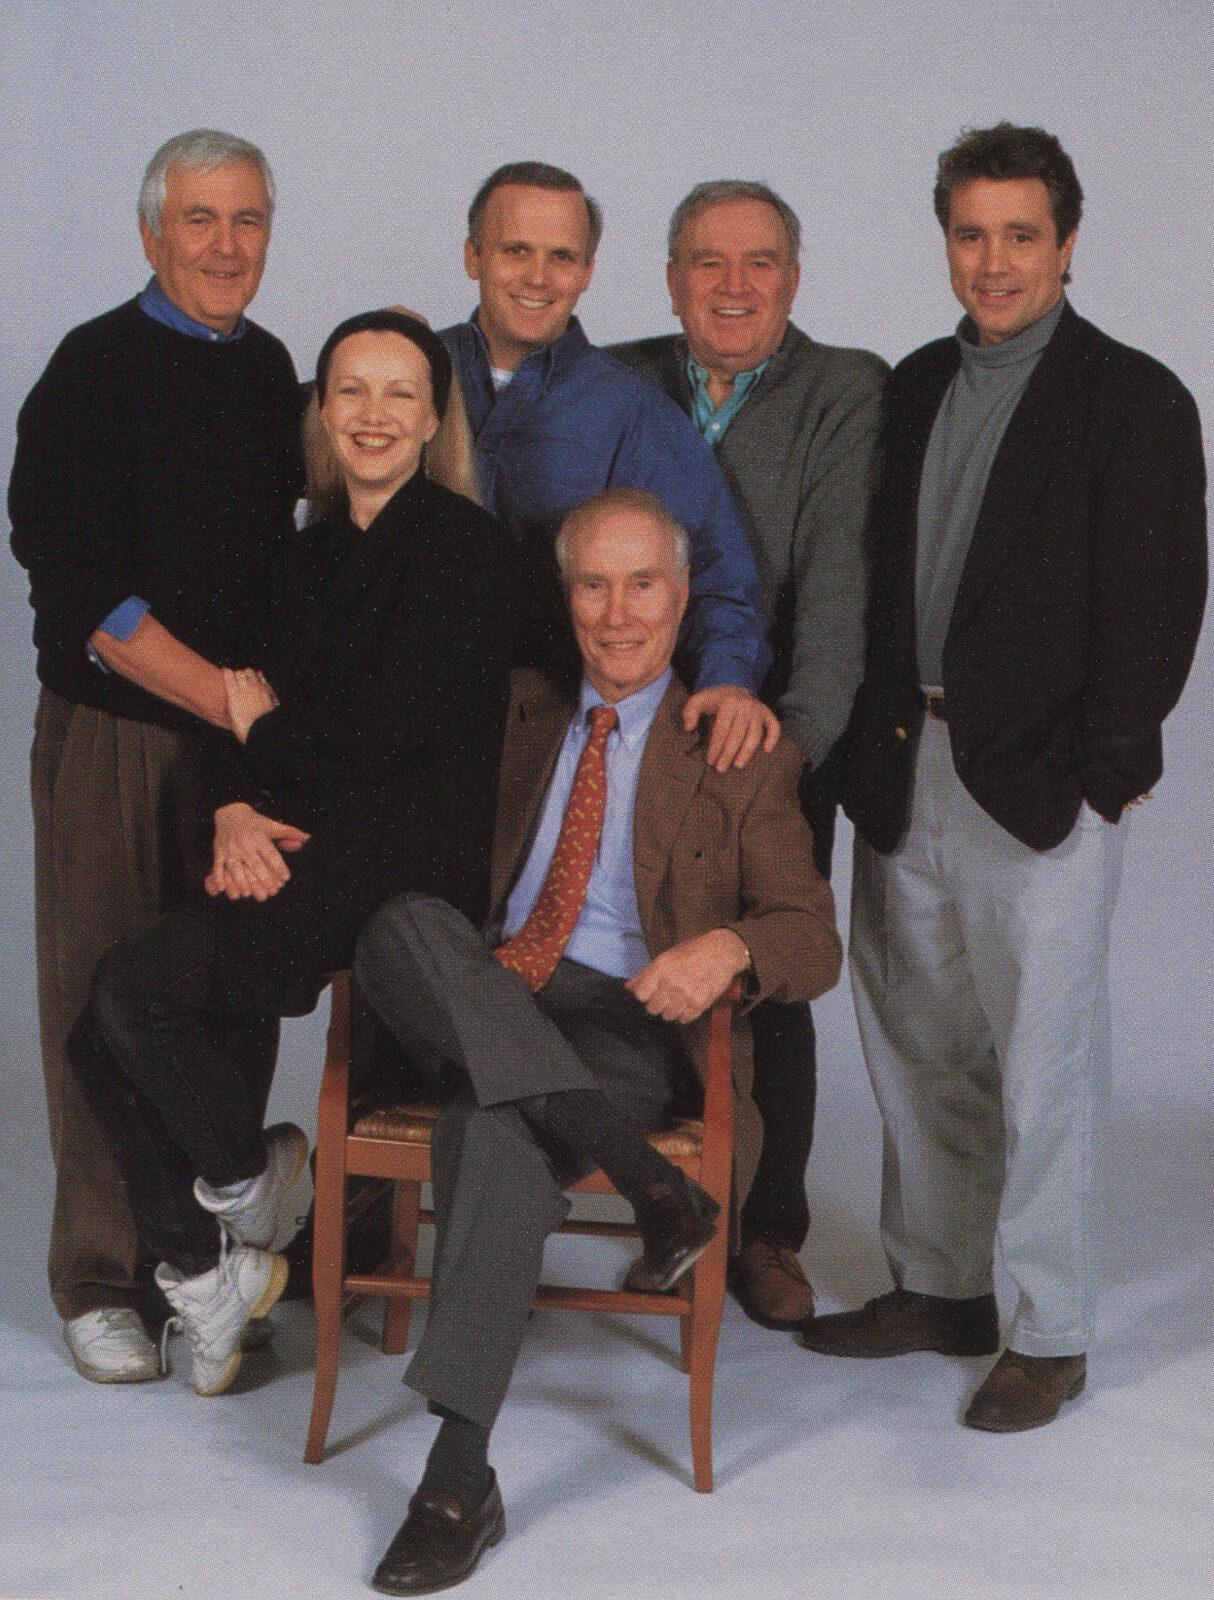 The Creative Team of Steel Pier- John Kander, Susan Stroman, Scott Ellis, Roger Berlind, Fred Ebb and David Thompson.